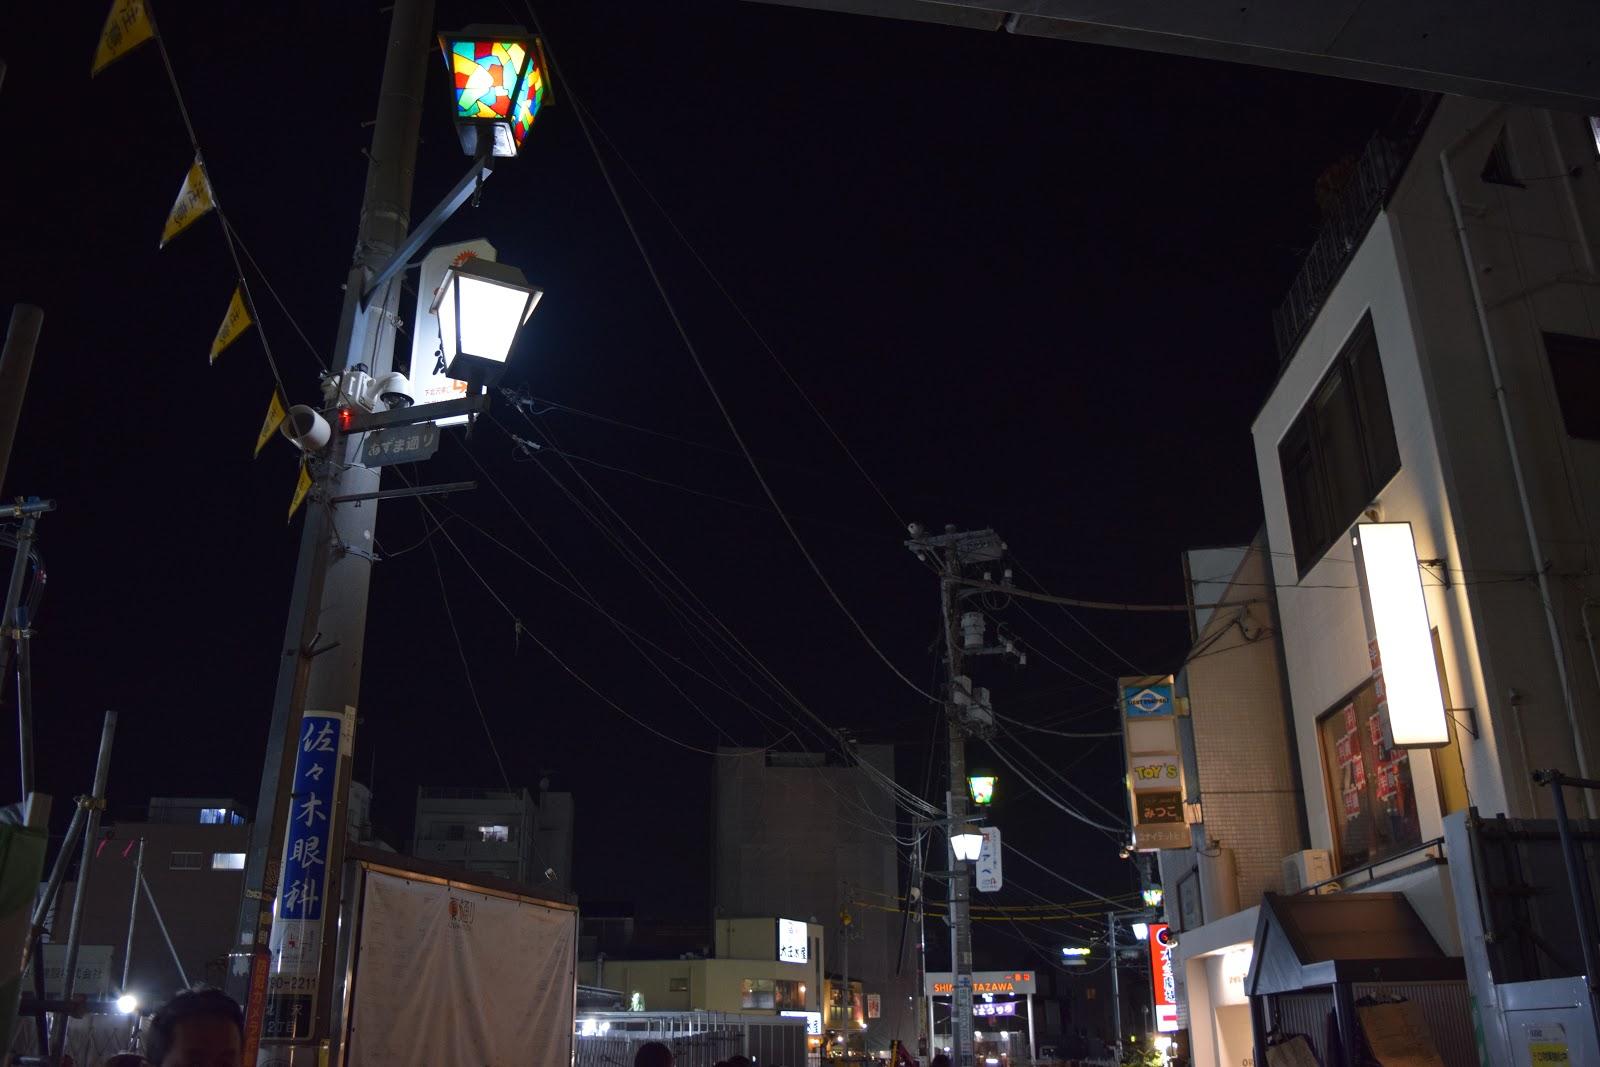 Ichiban gai sign in the background- Shimokitazawa station area